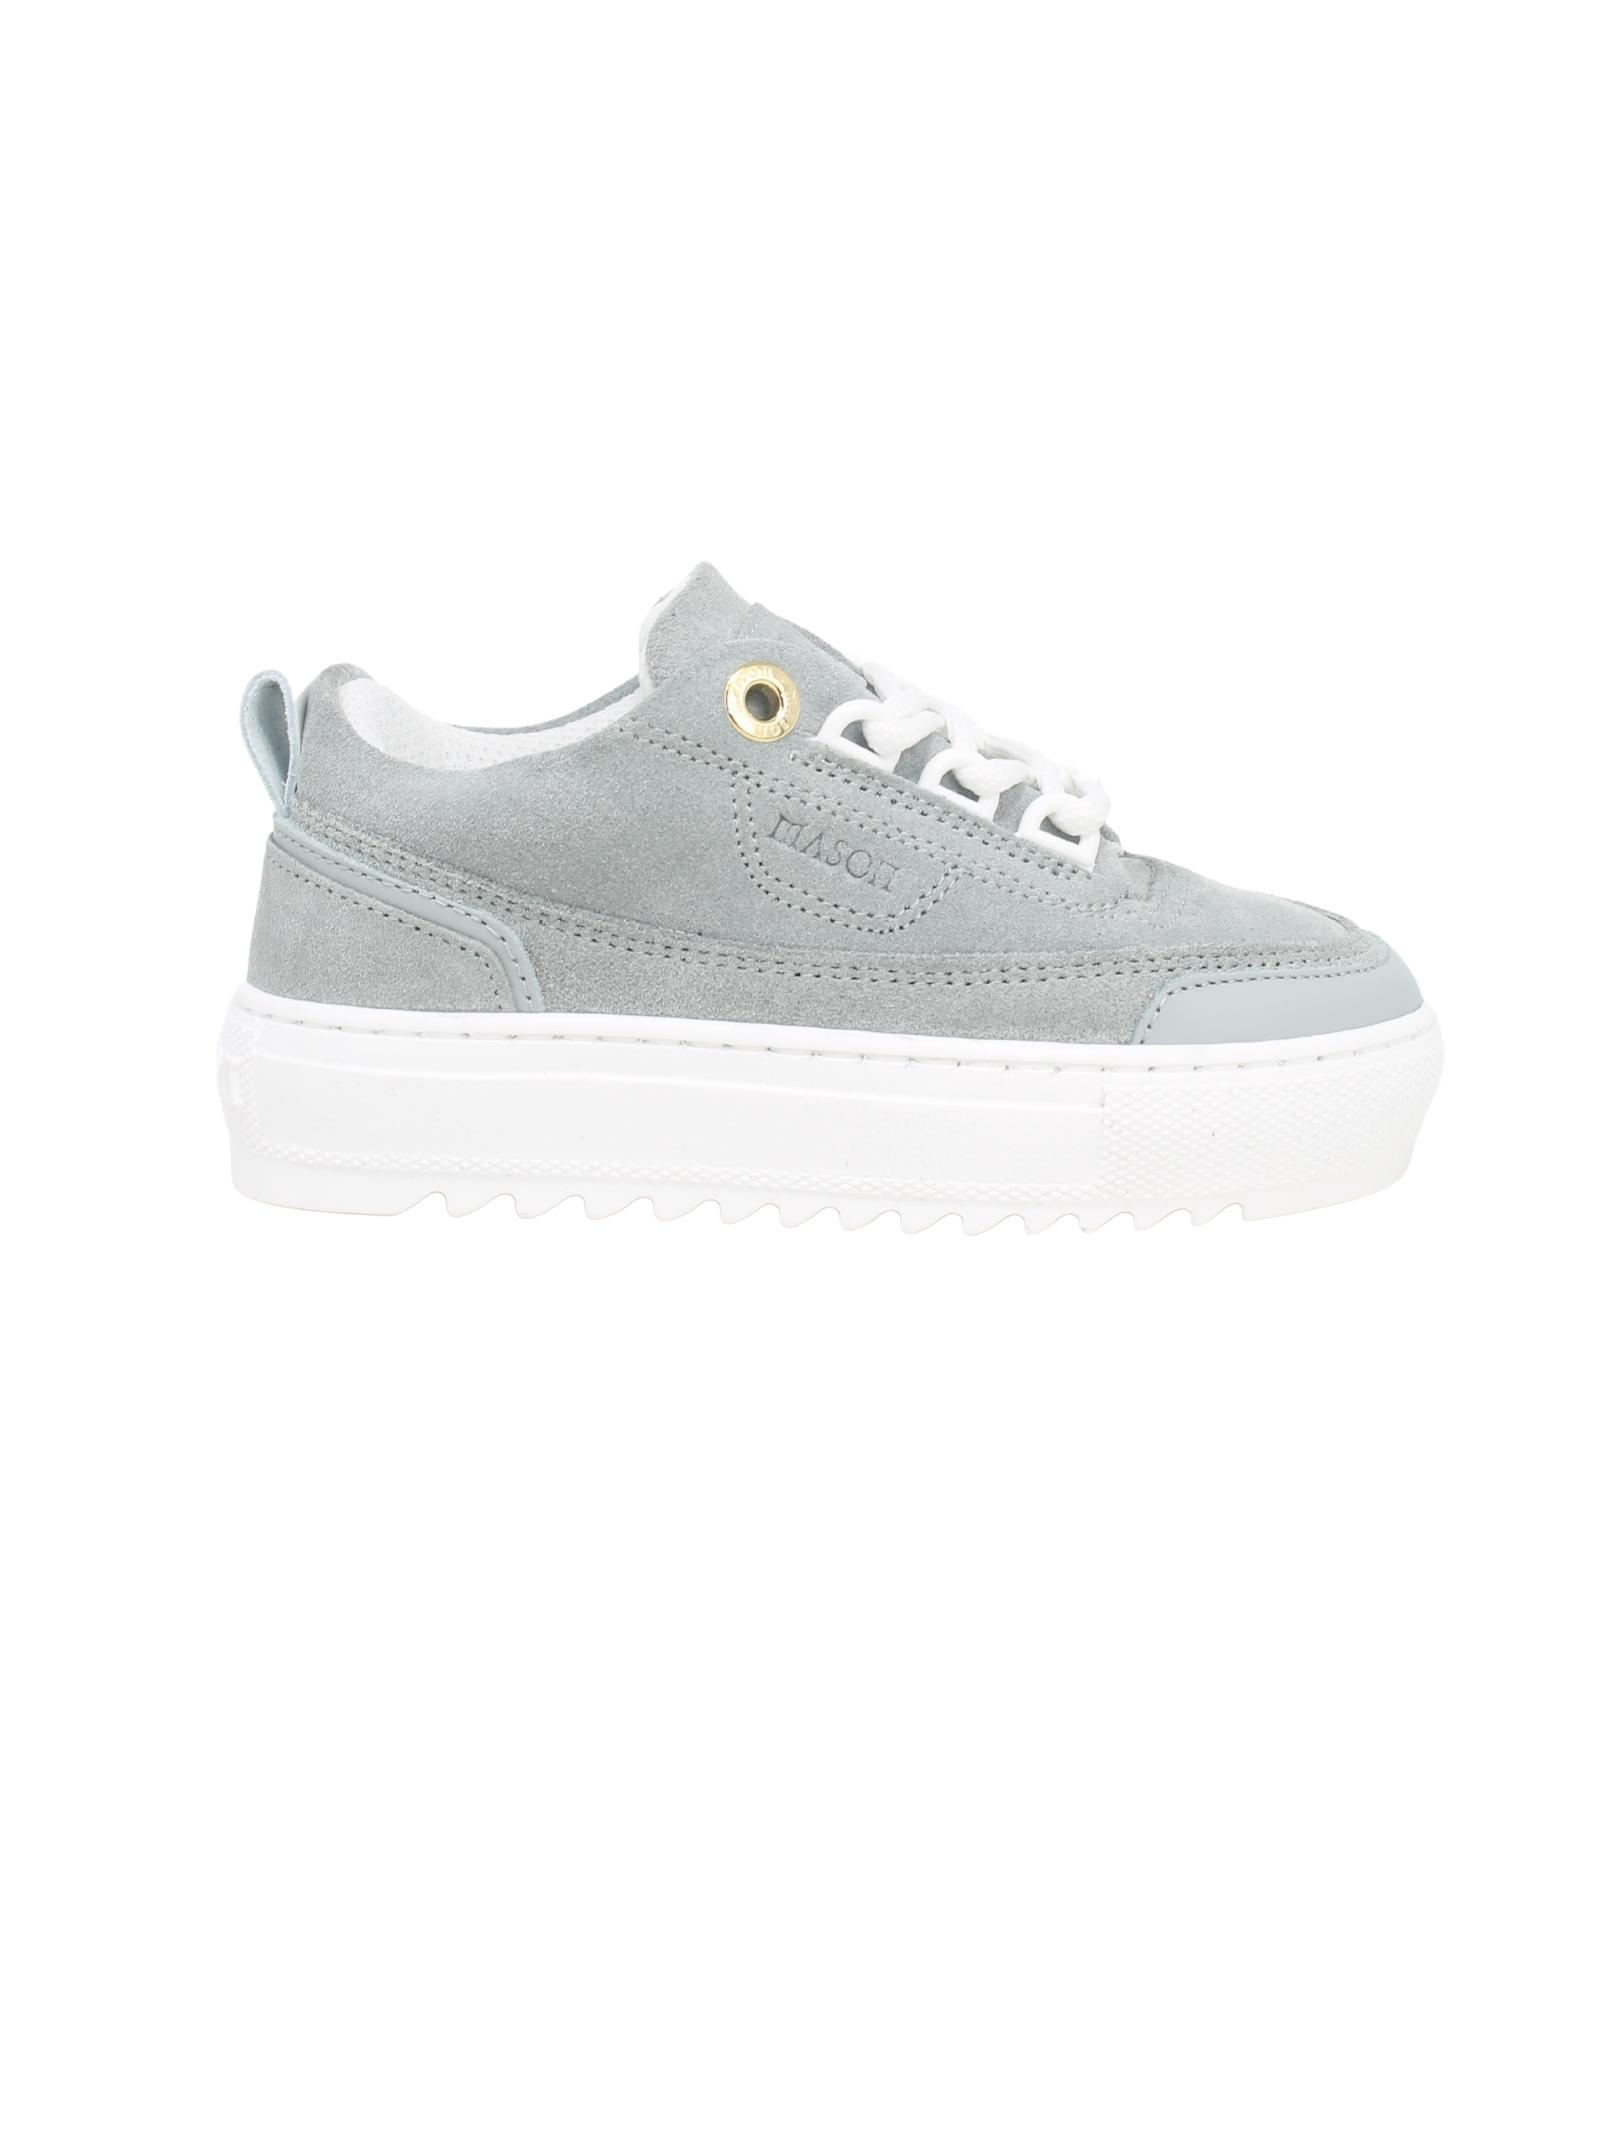 Sneakers Iconica Firenze Bambino MASON GARMENTS KIDS | Sneakers | BFW216AGRIGIO